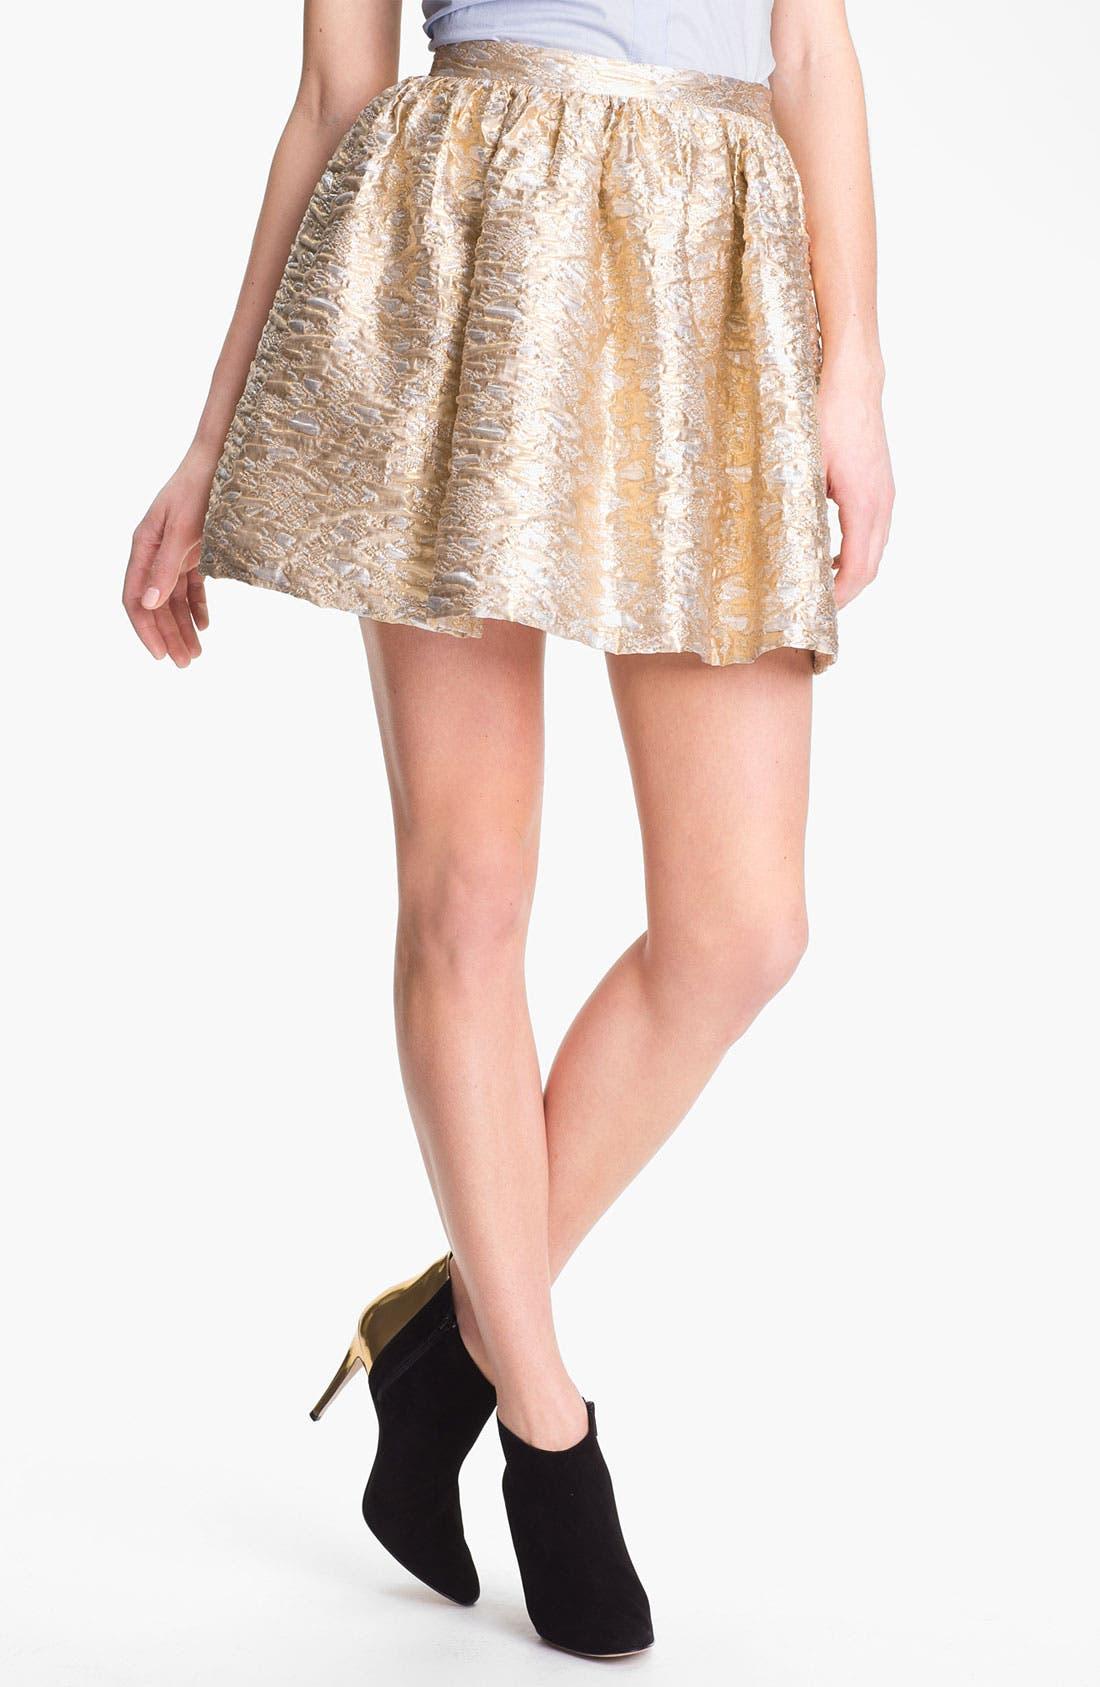 Alternate Image 1 Selected - Man Repeller X PJK 'Laverne' Skirt